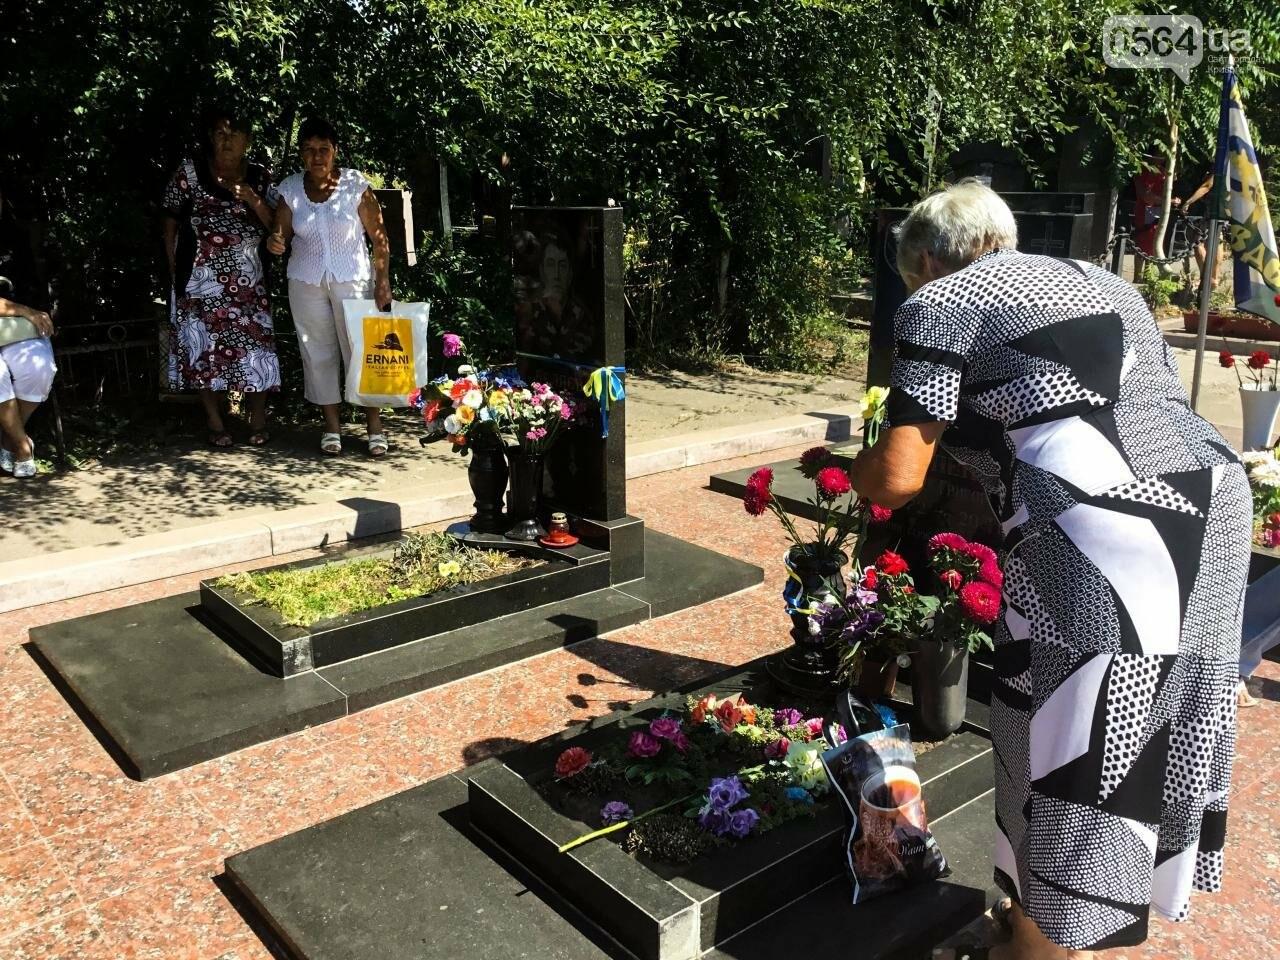 На Аллее Героев провели панихиду по погибшим в зоне АТО криворожанам, - ФОТО , фото-32